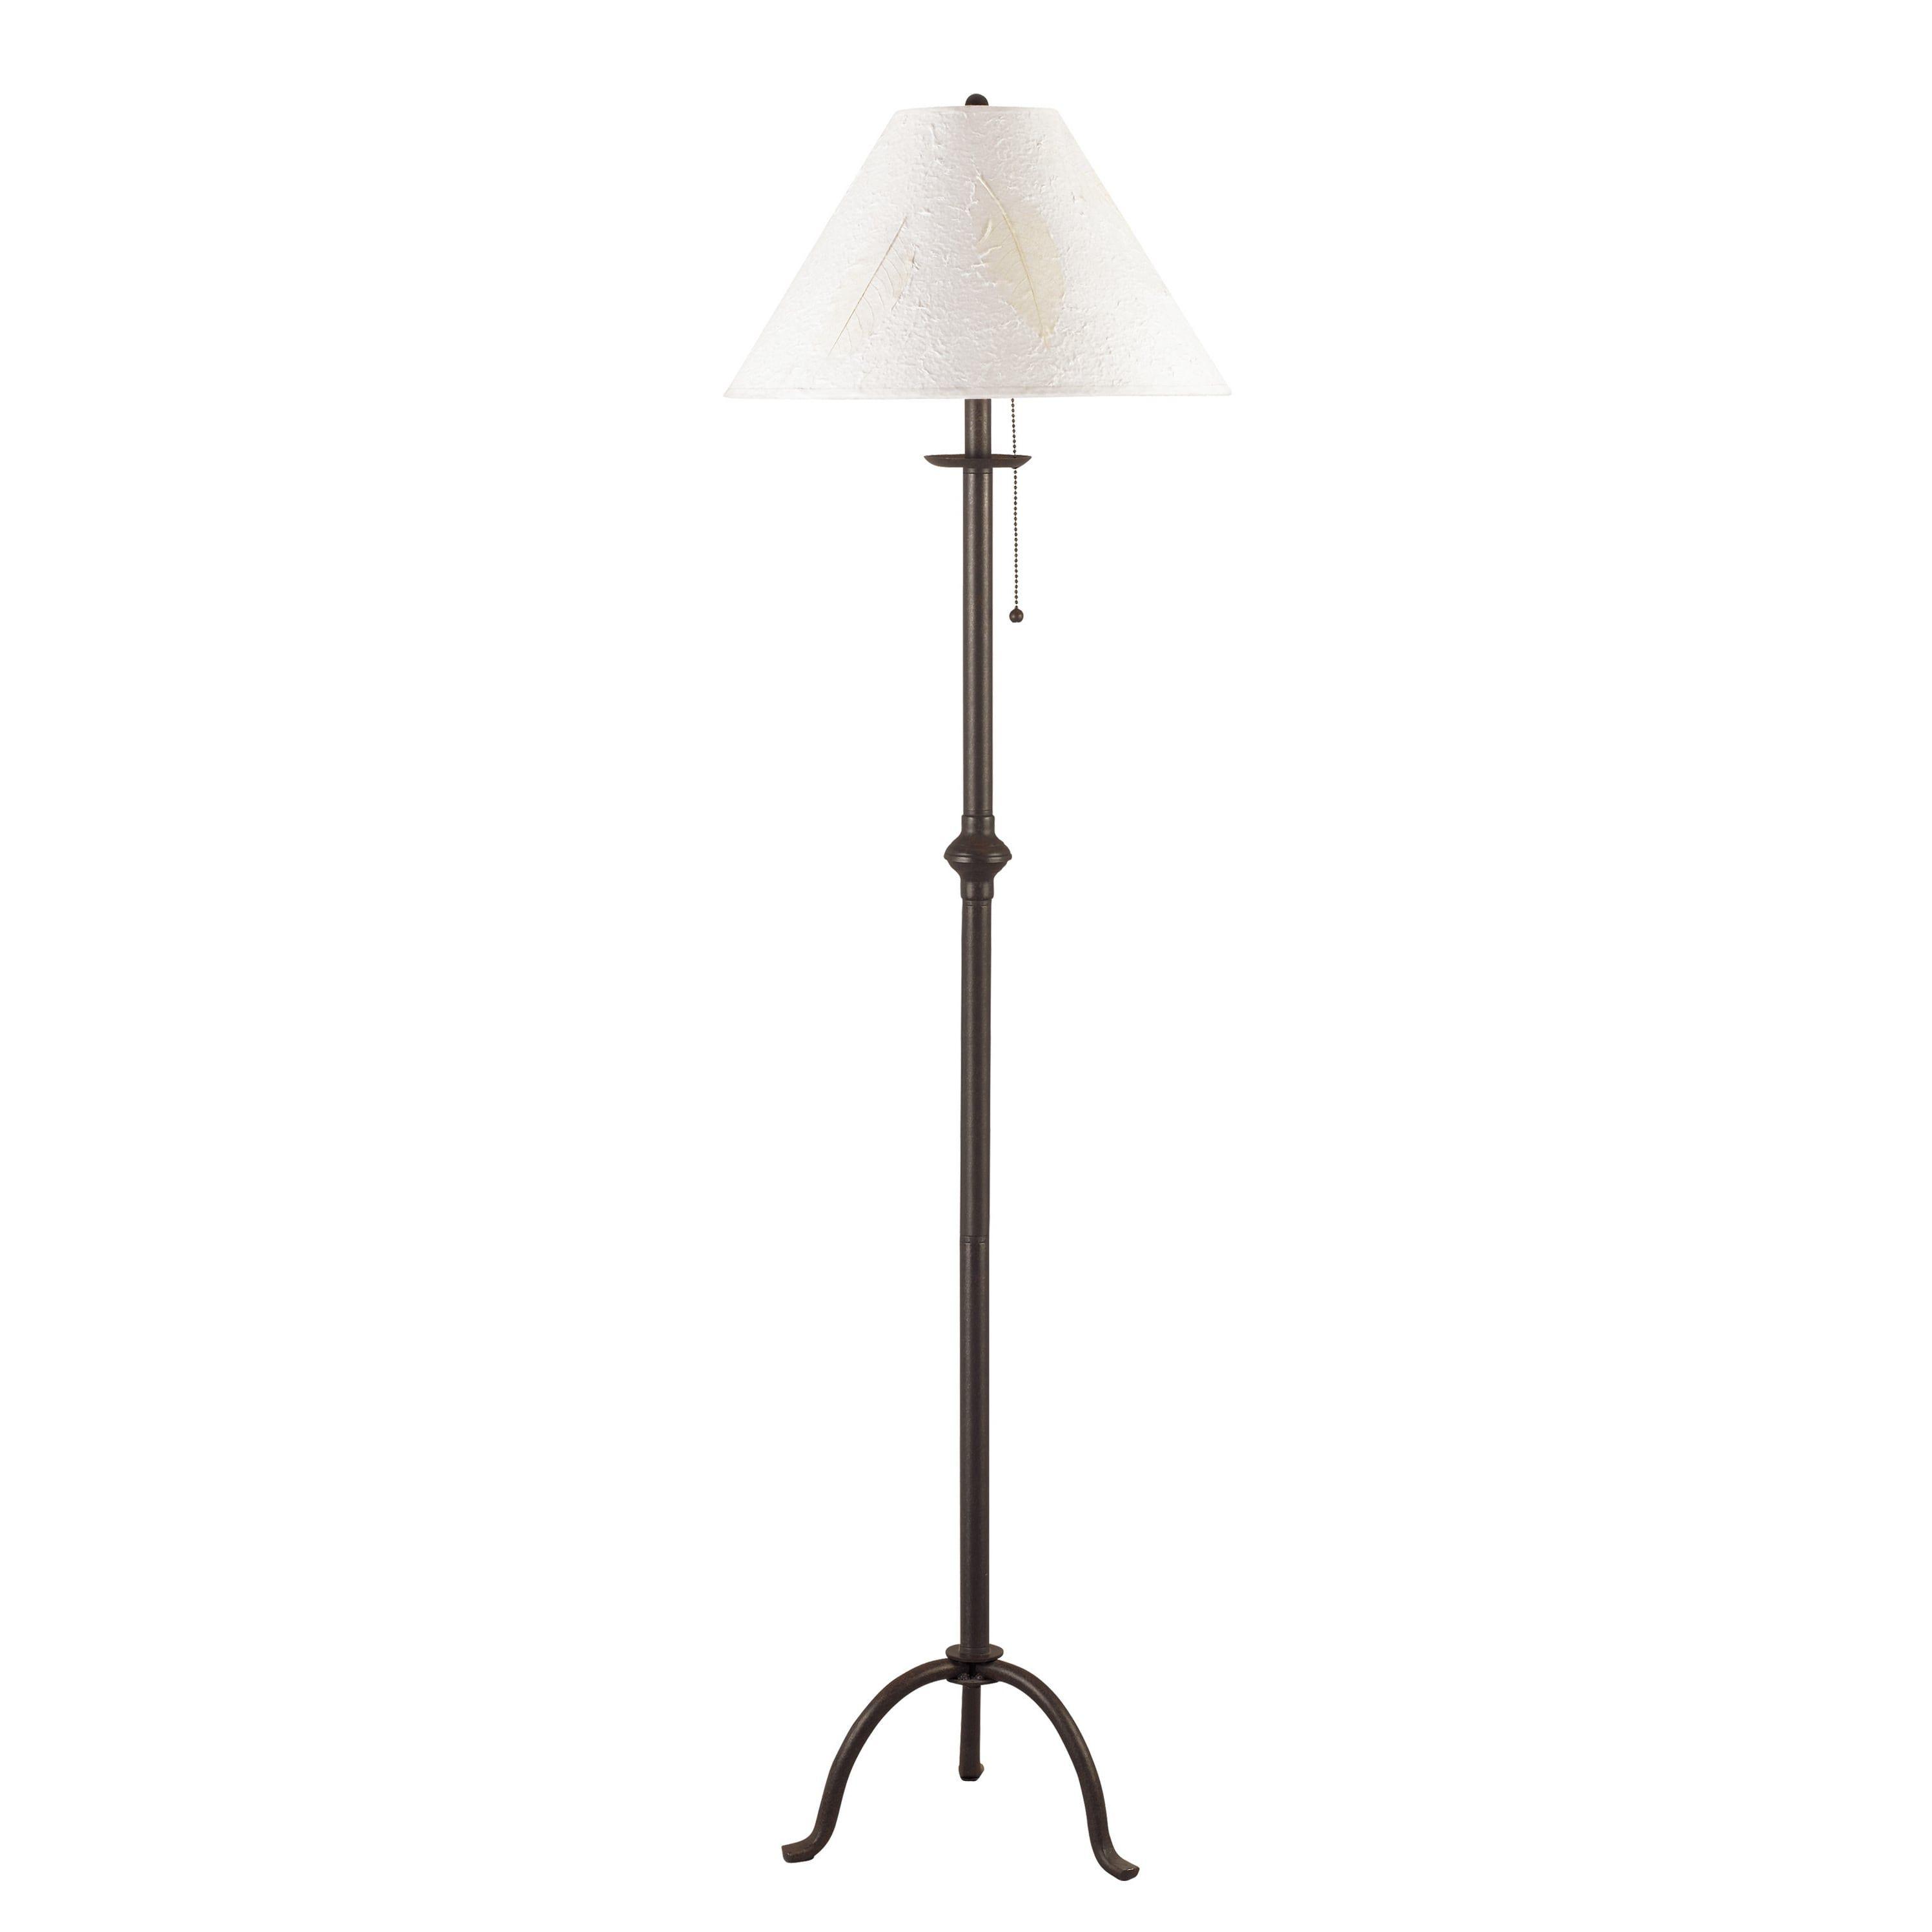 100 Watt Iron Floor Lamp With Pull Chain - Overstockcom Shopping